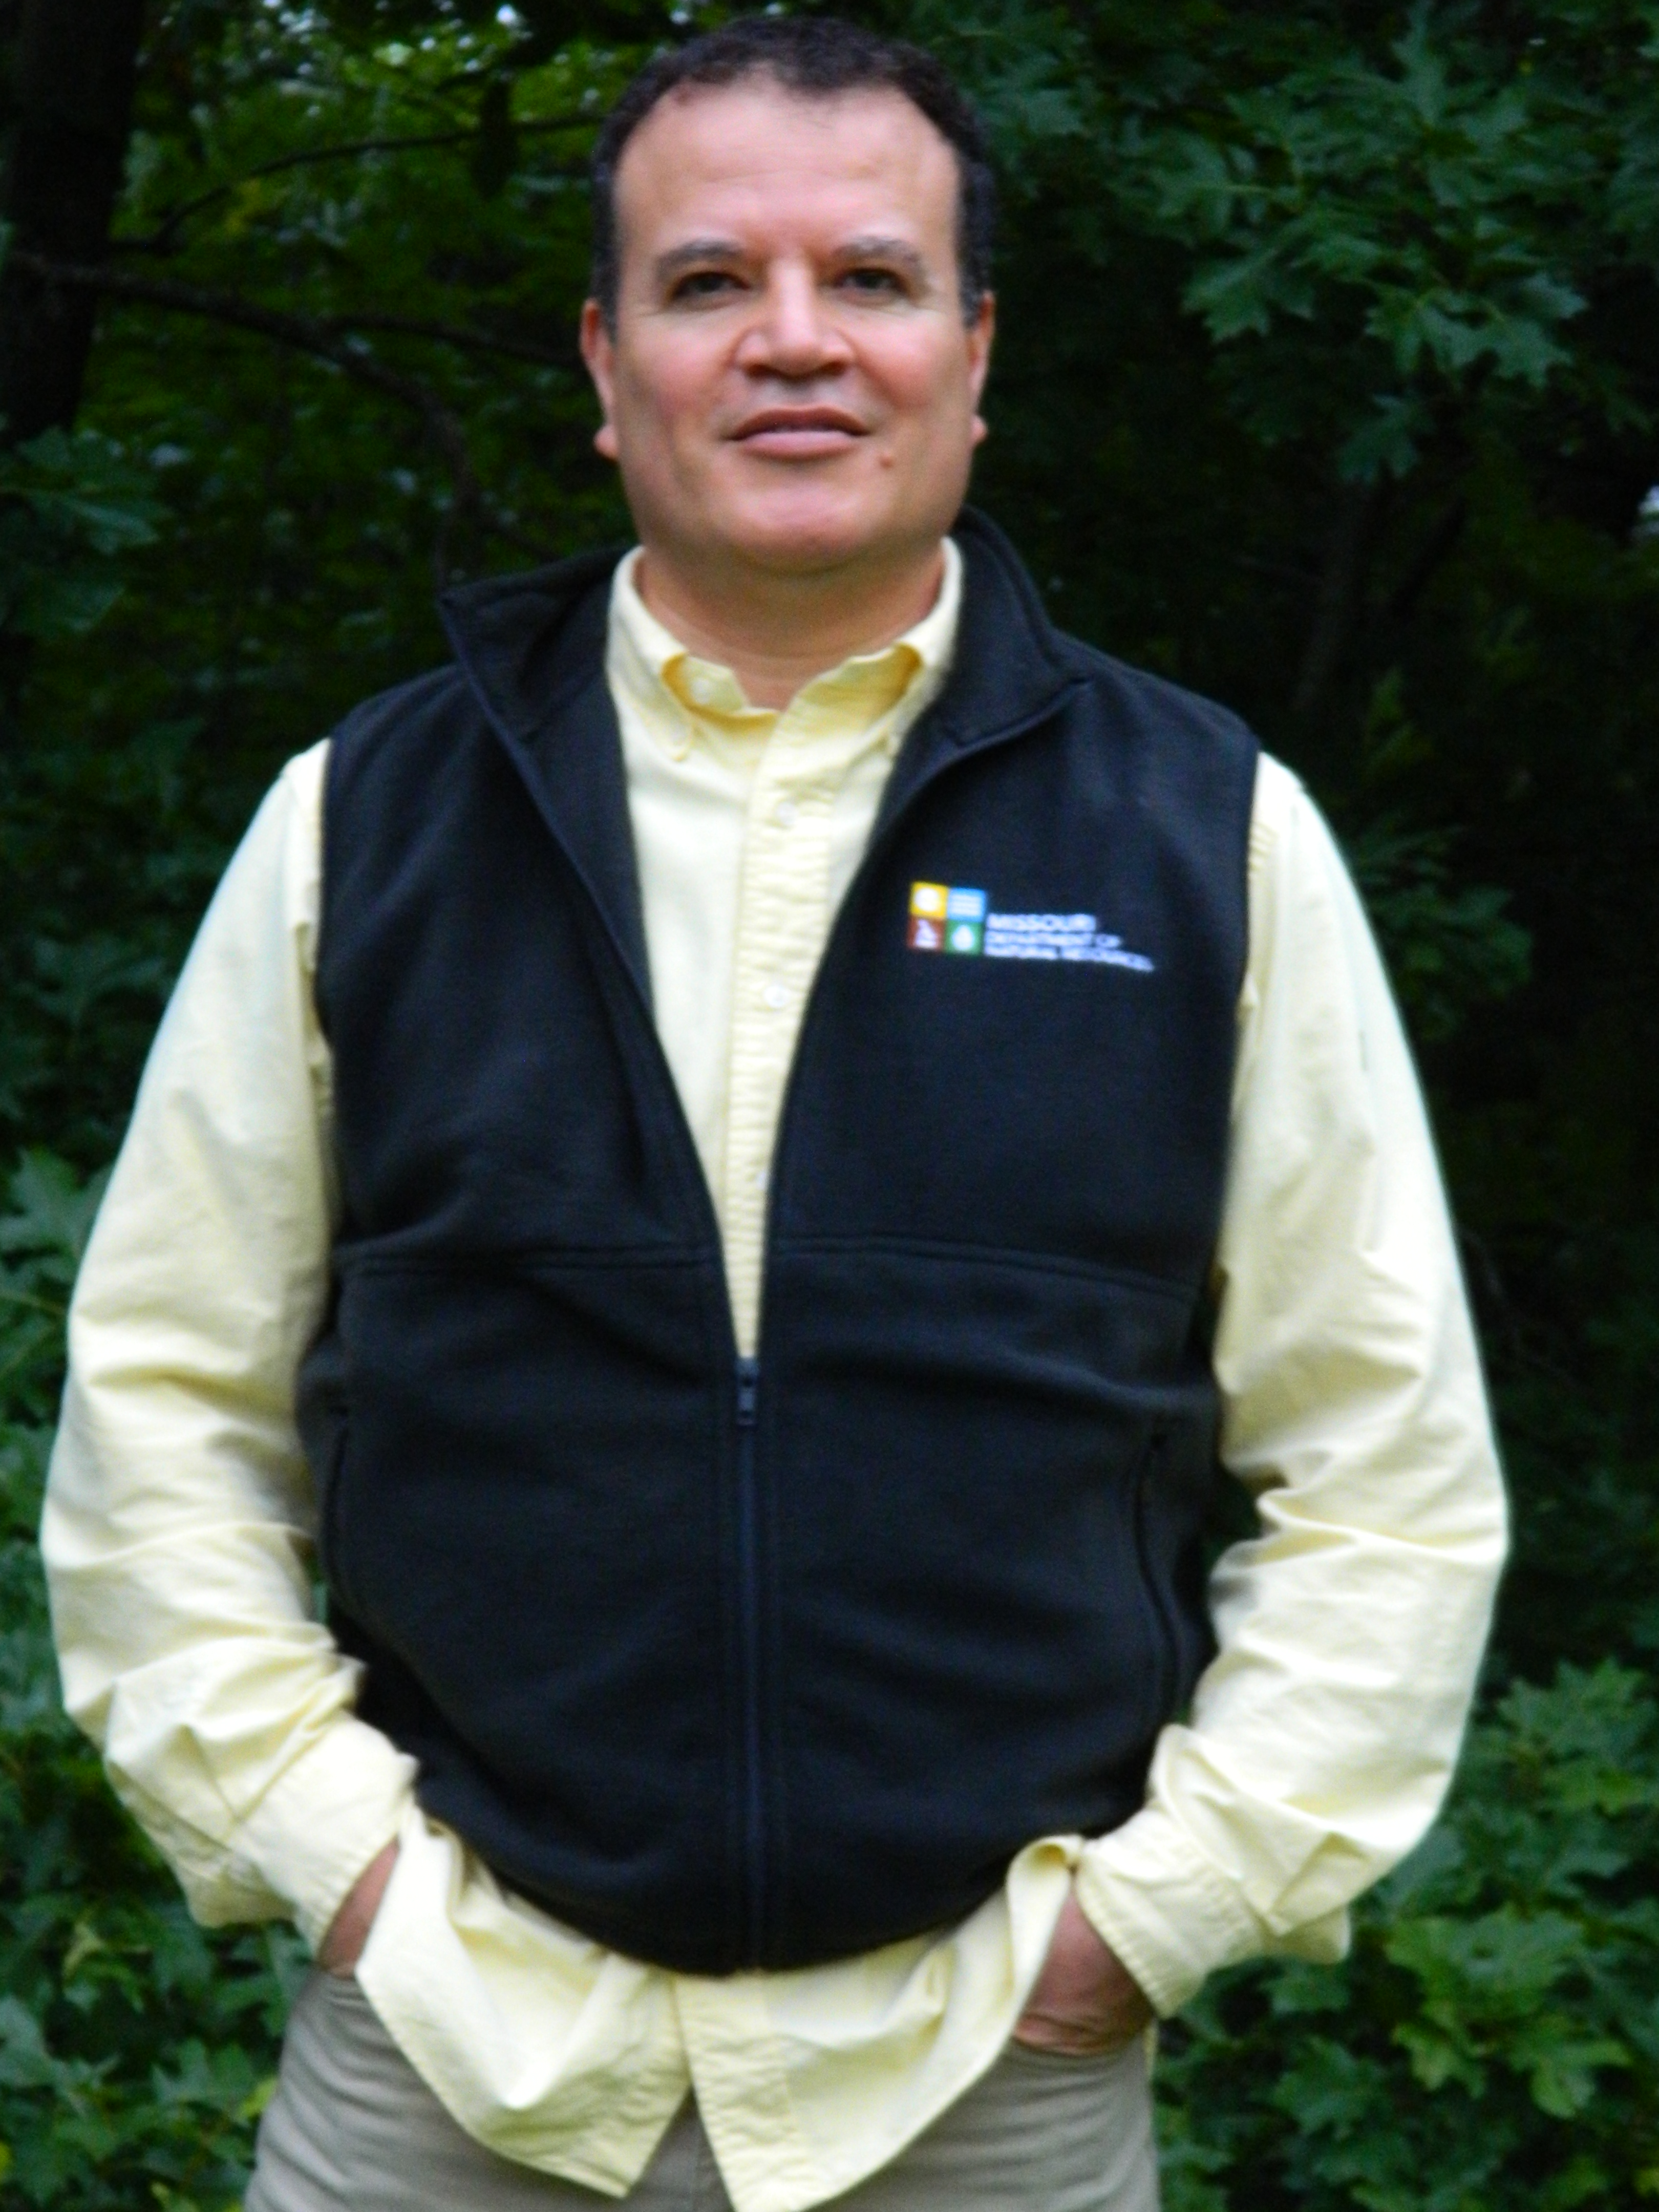 Ruben Zamarripa